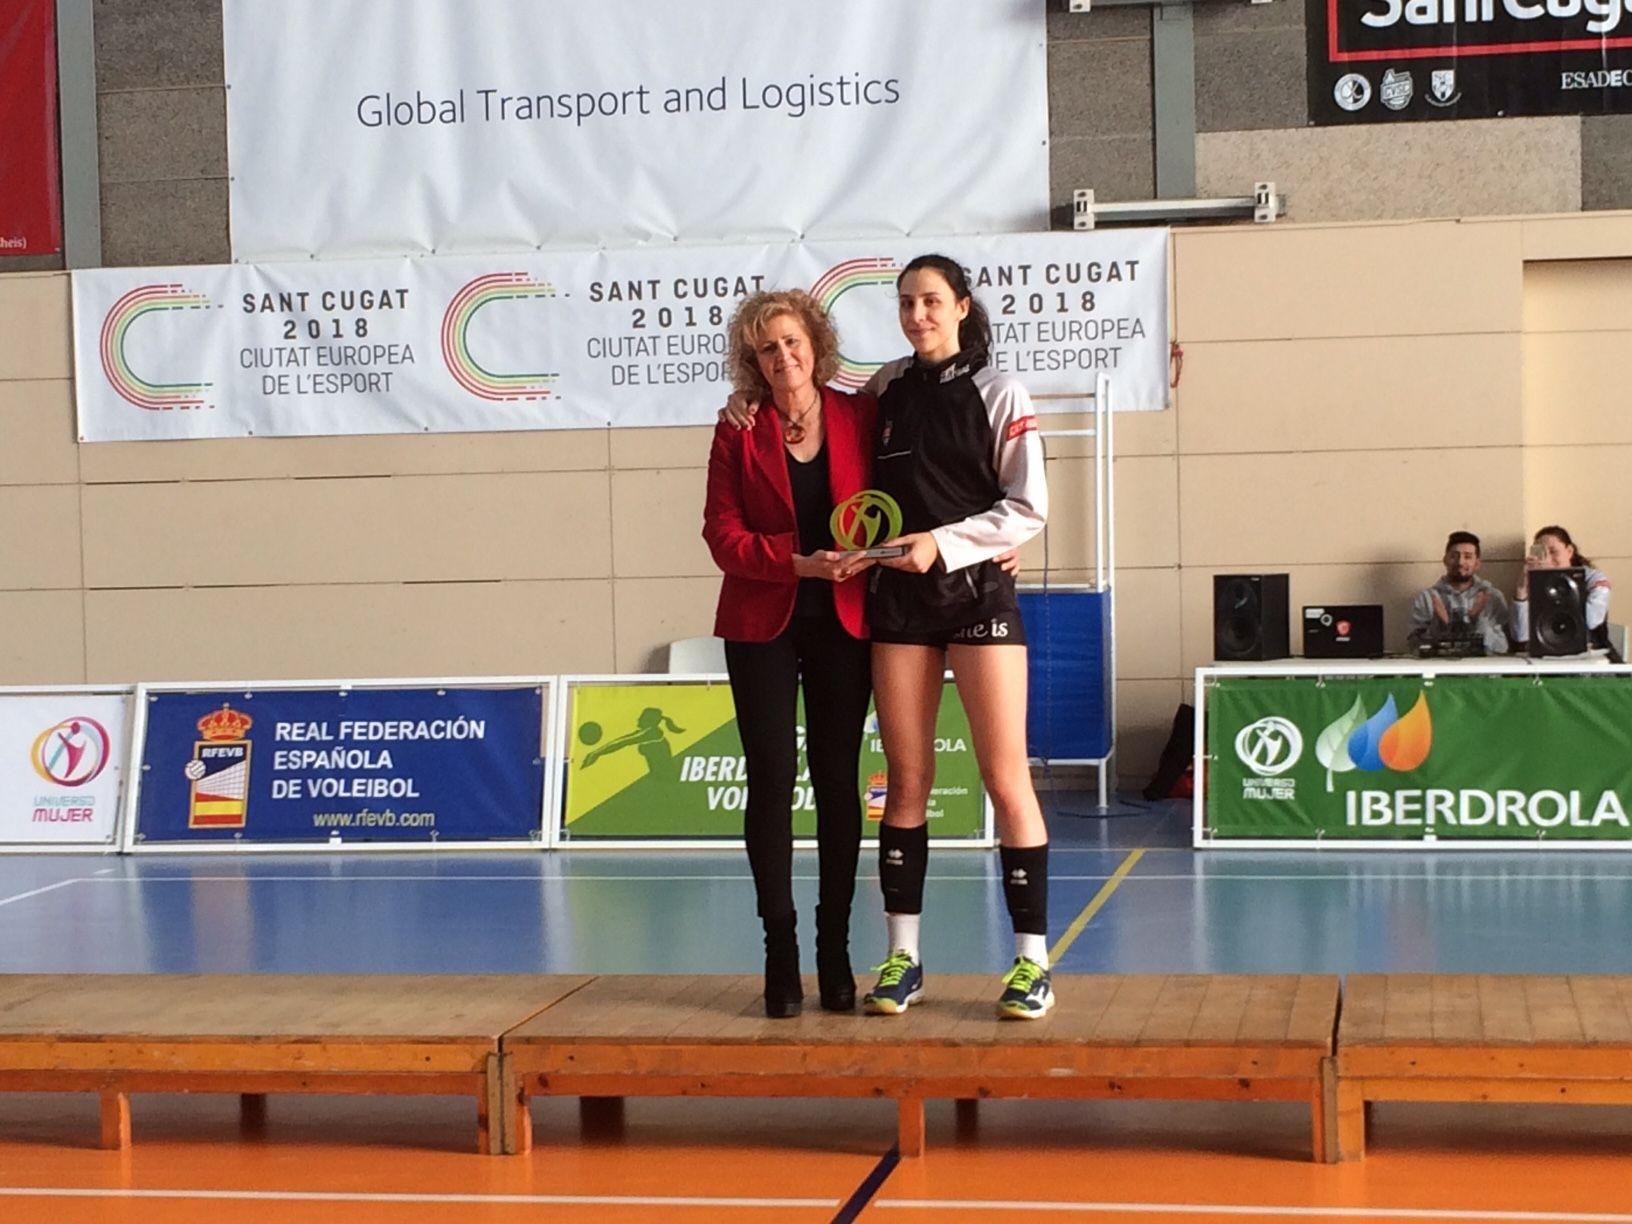 Aina Berbel, MVP de la Superlliga Júnior Femenina 2018. FOTO: Àlex López Puig